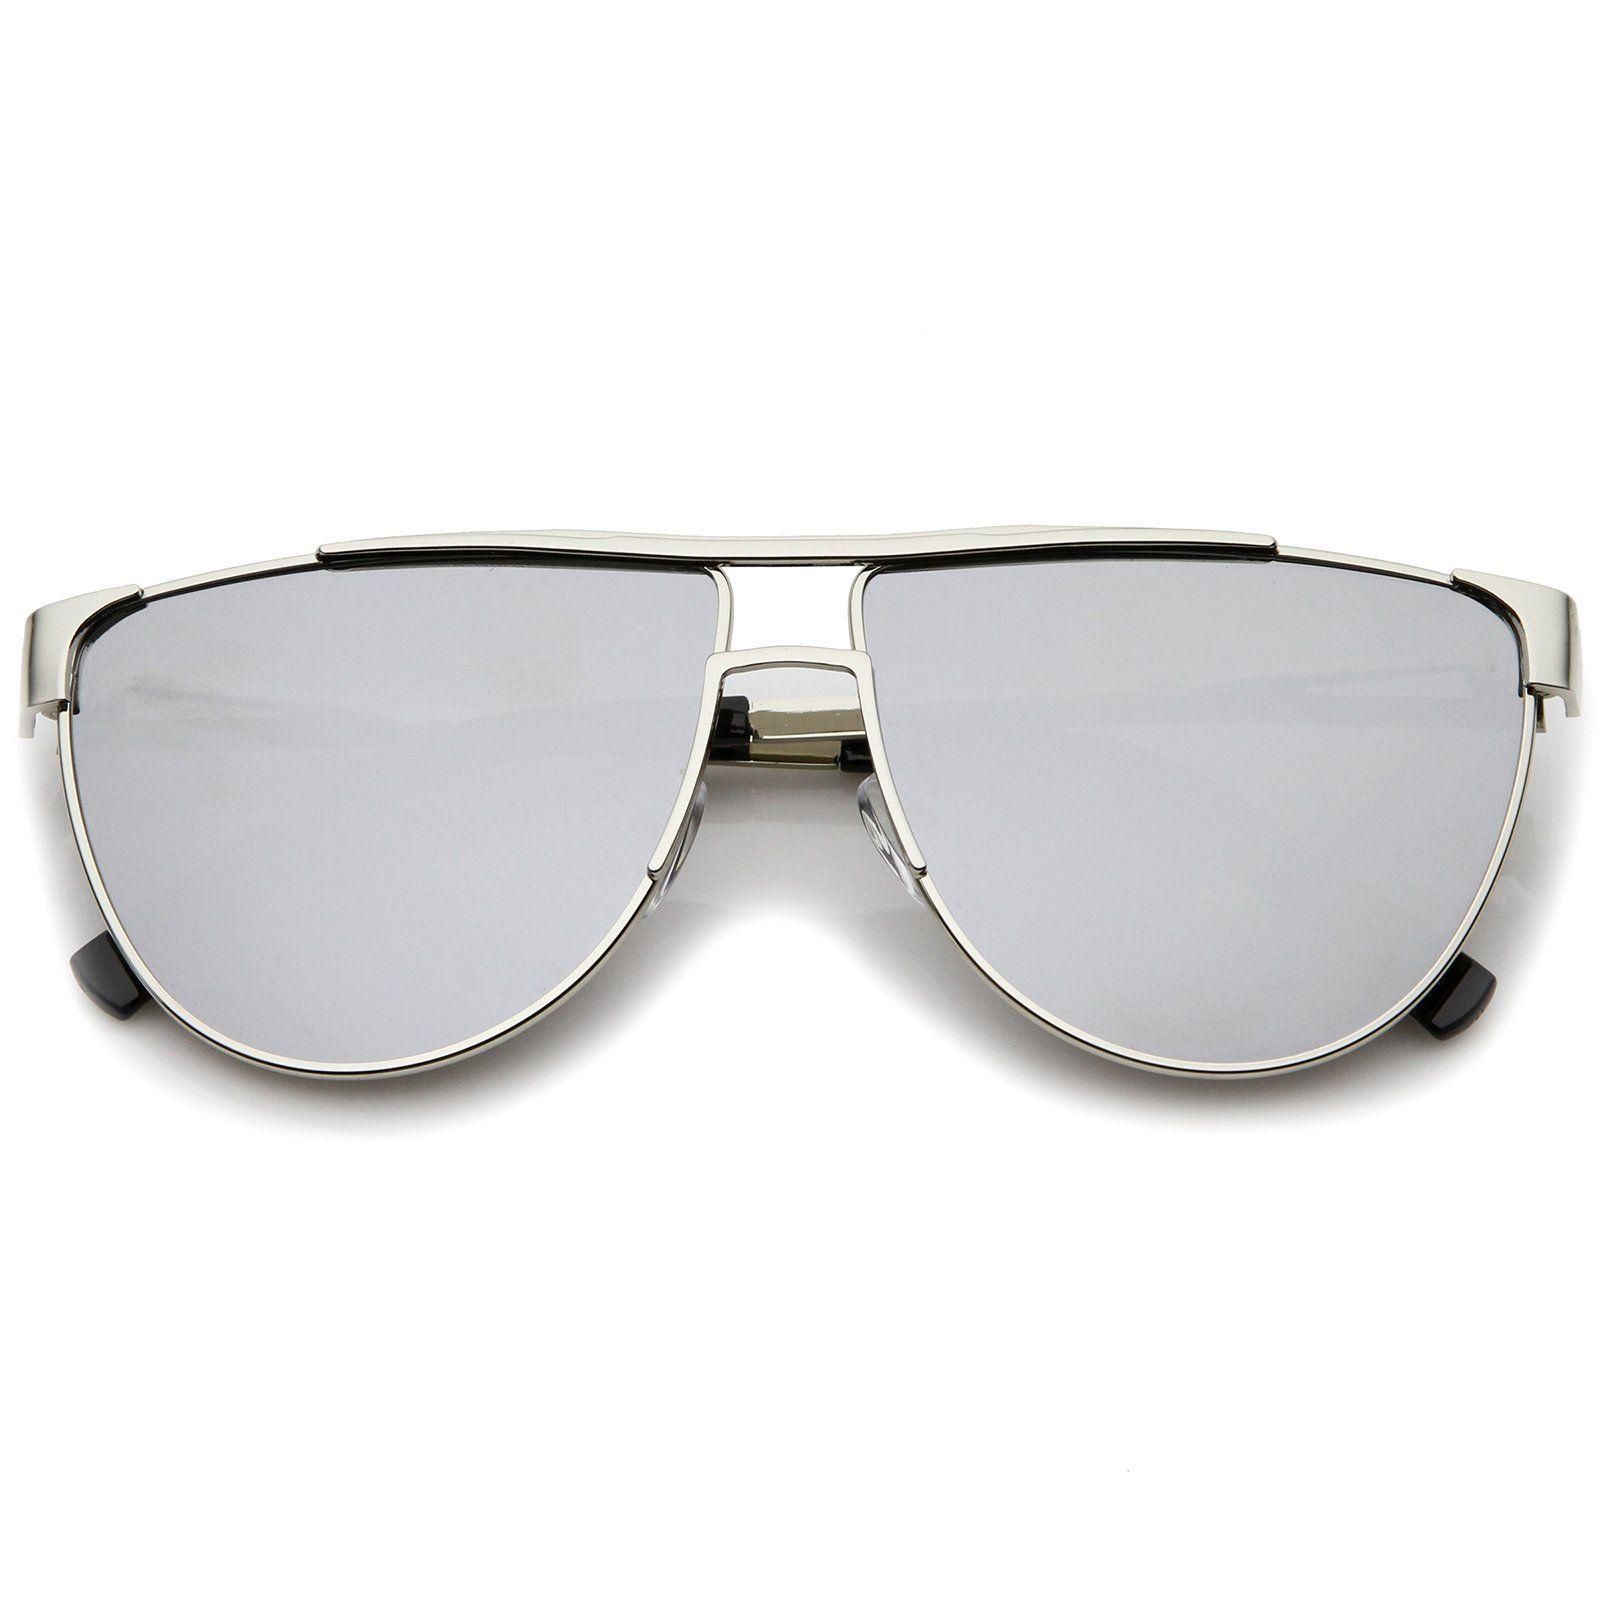 Modern Flat Top Colored Mirror Flat Lens Aviator Sunglasses 63Mm